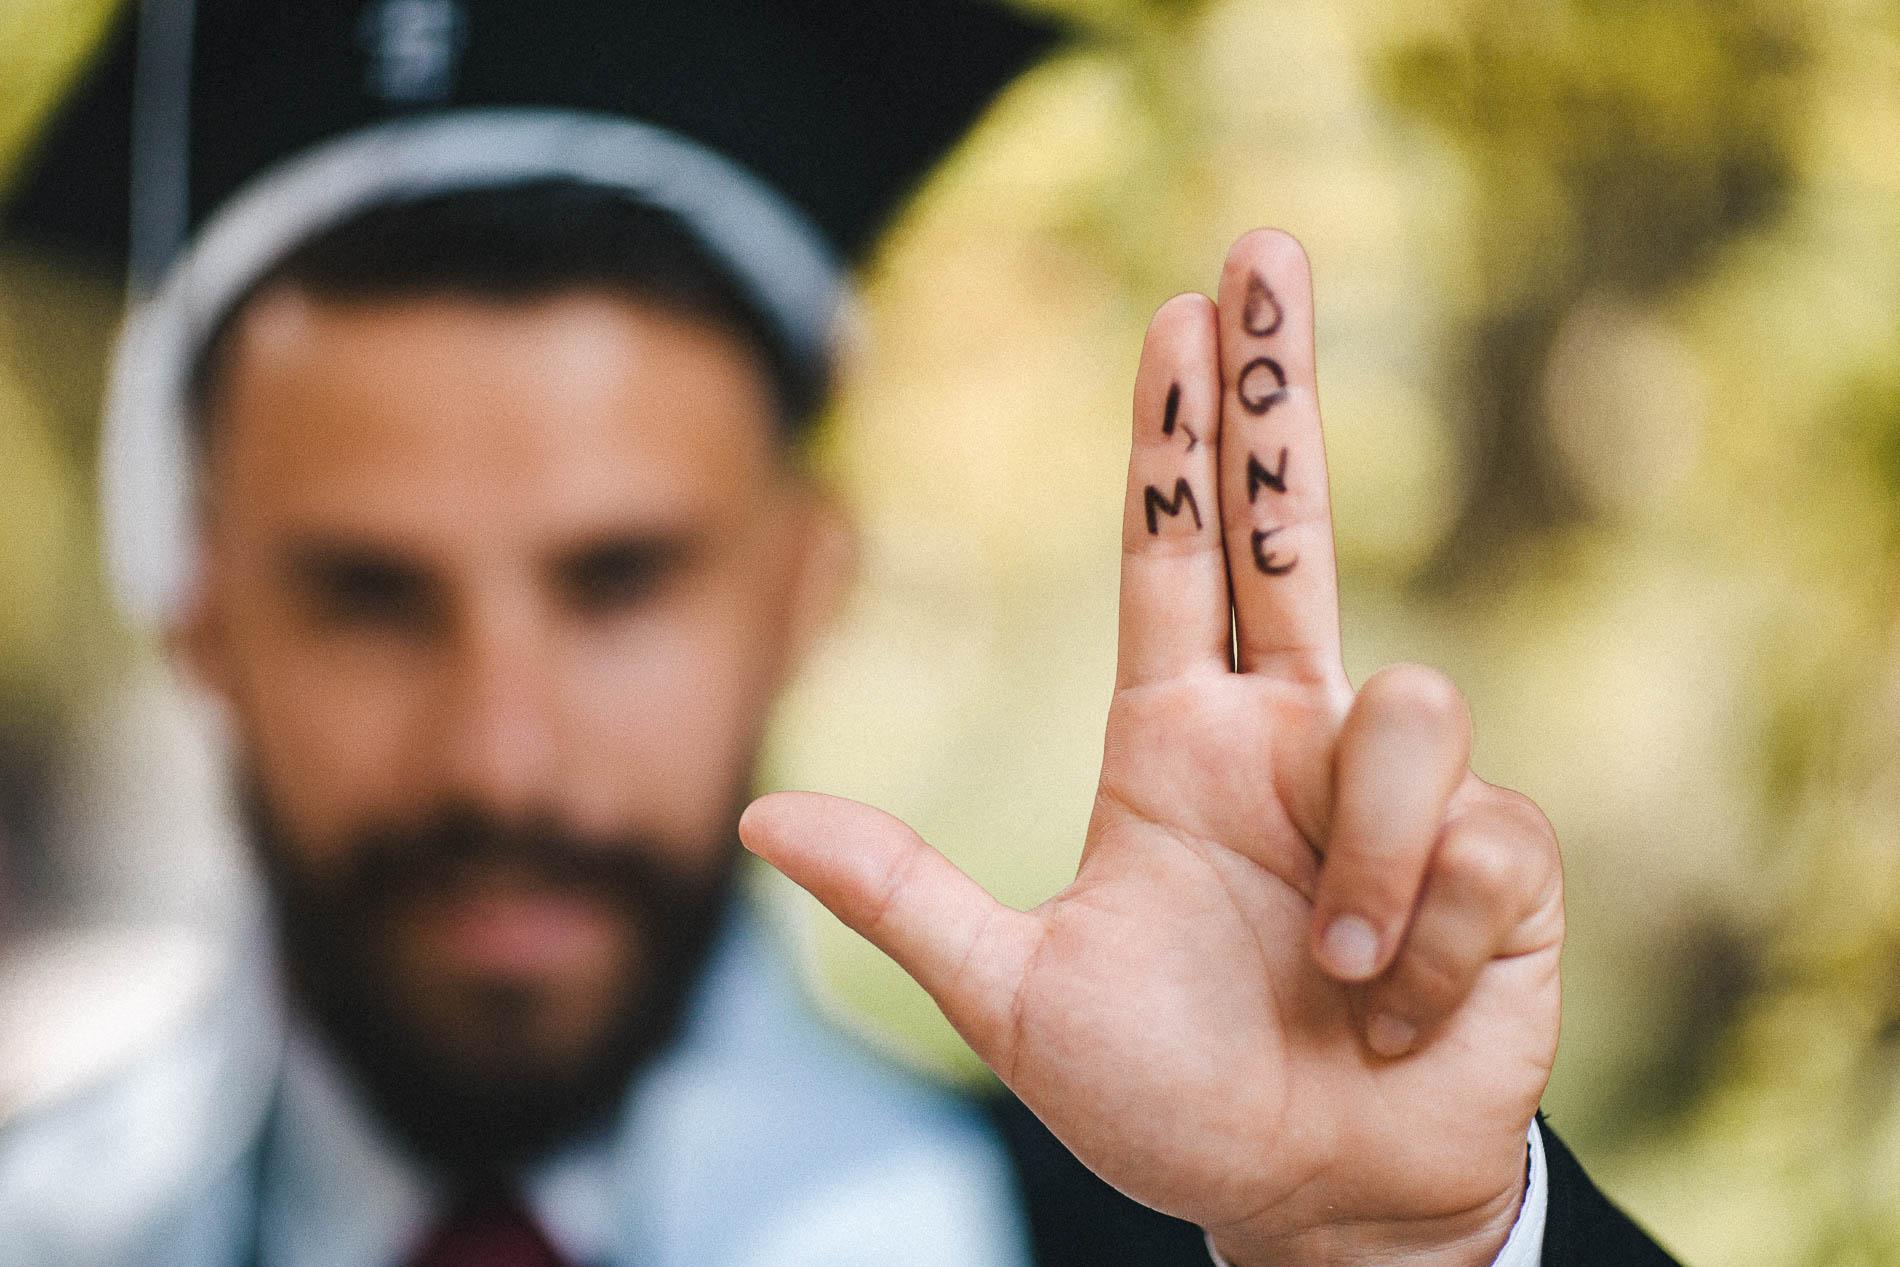 fotografii de absolvire senior portrait foto portret universitatea de medicina si farmacie targu mures9